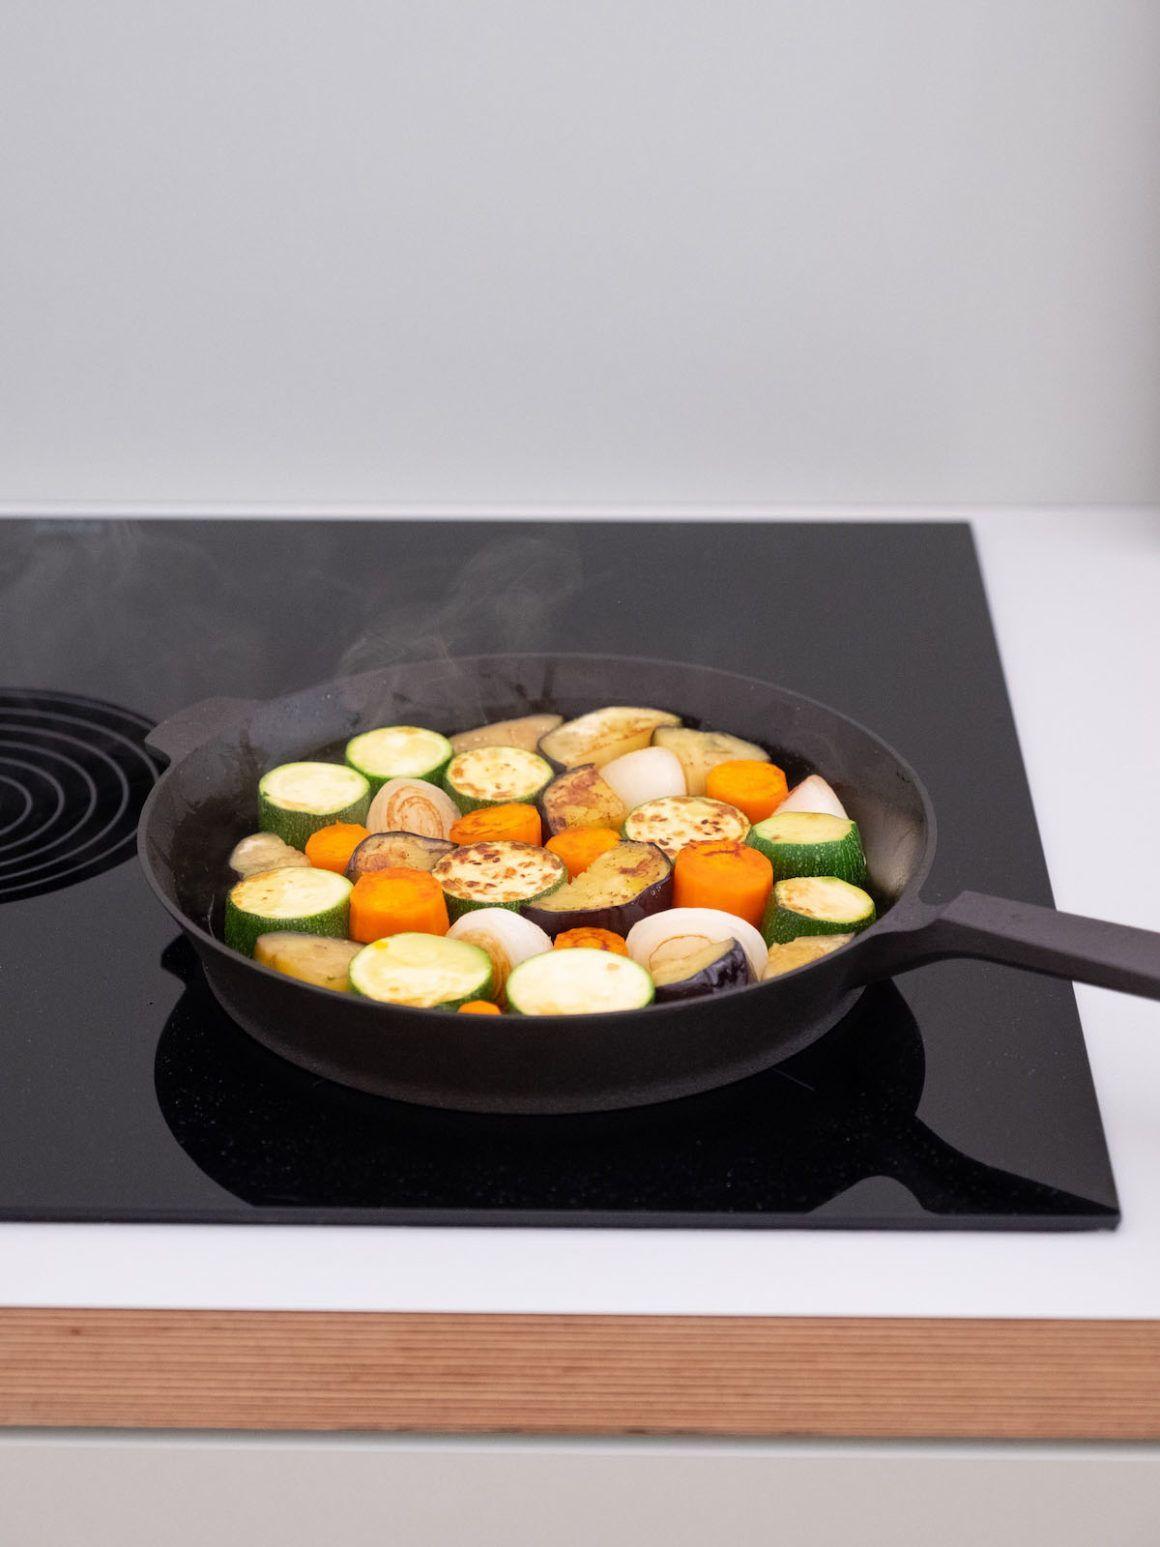 Foodblog, About Fuel, Rezept, Pfanne, Gemüse